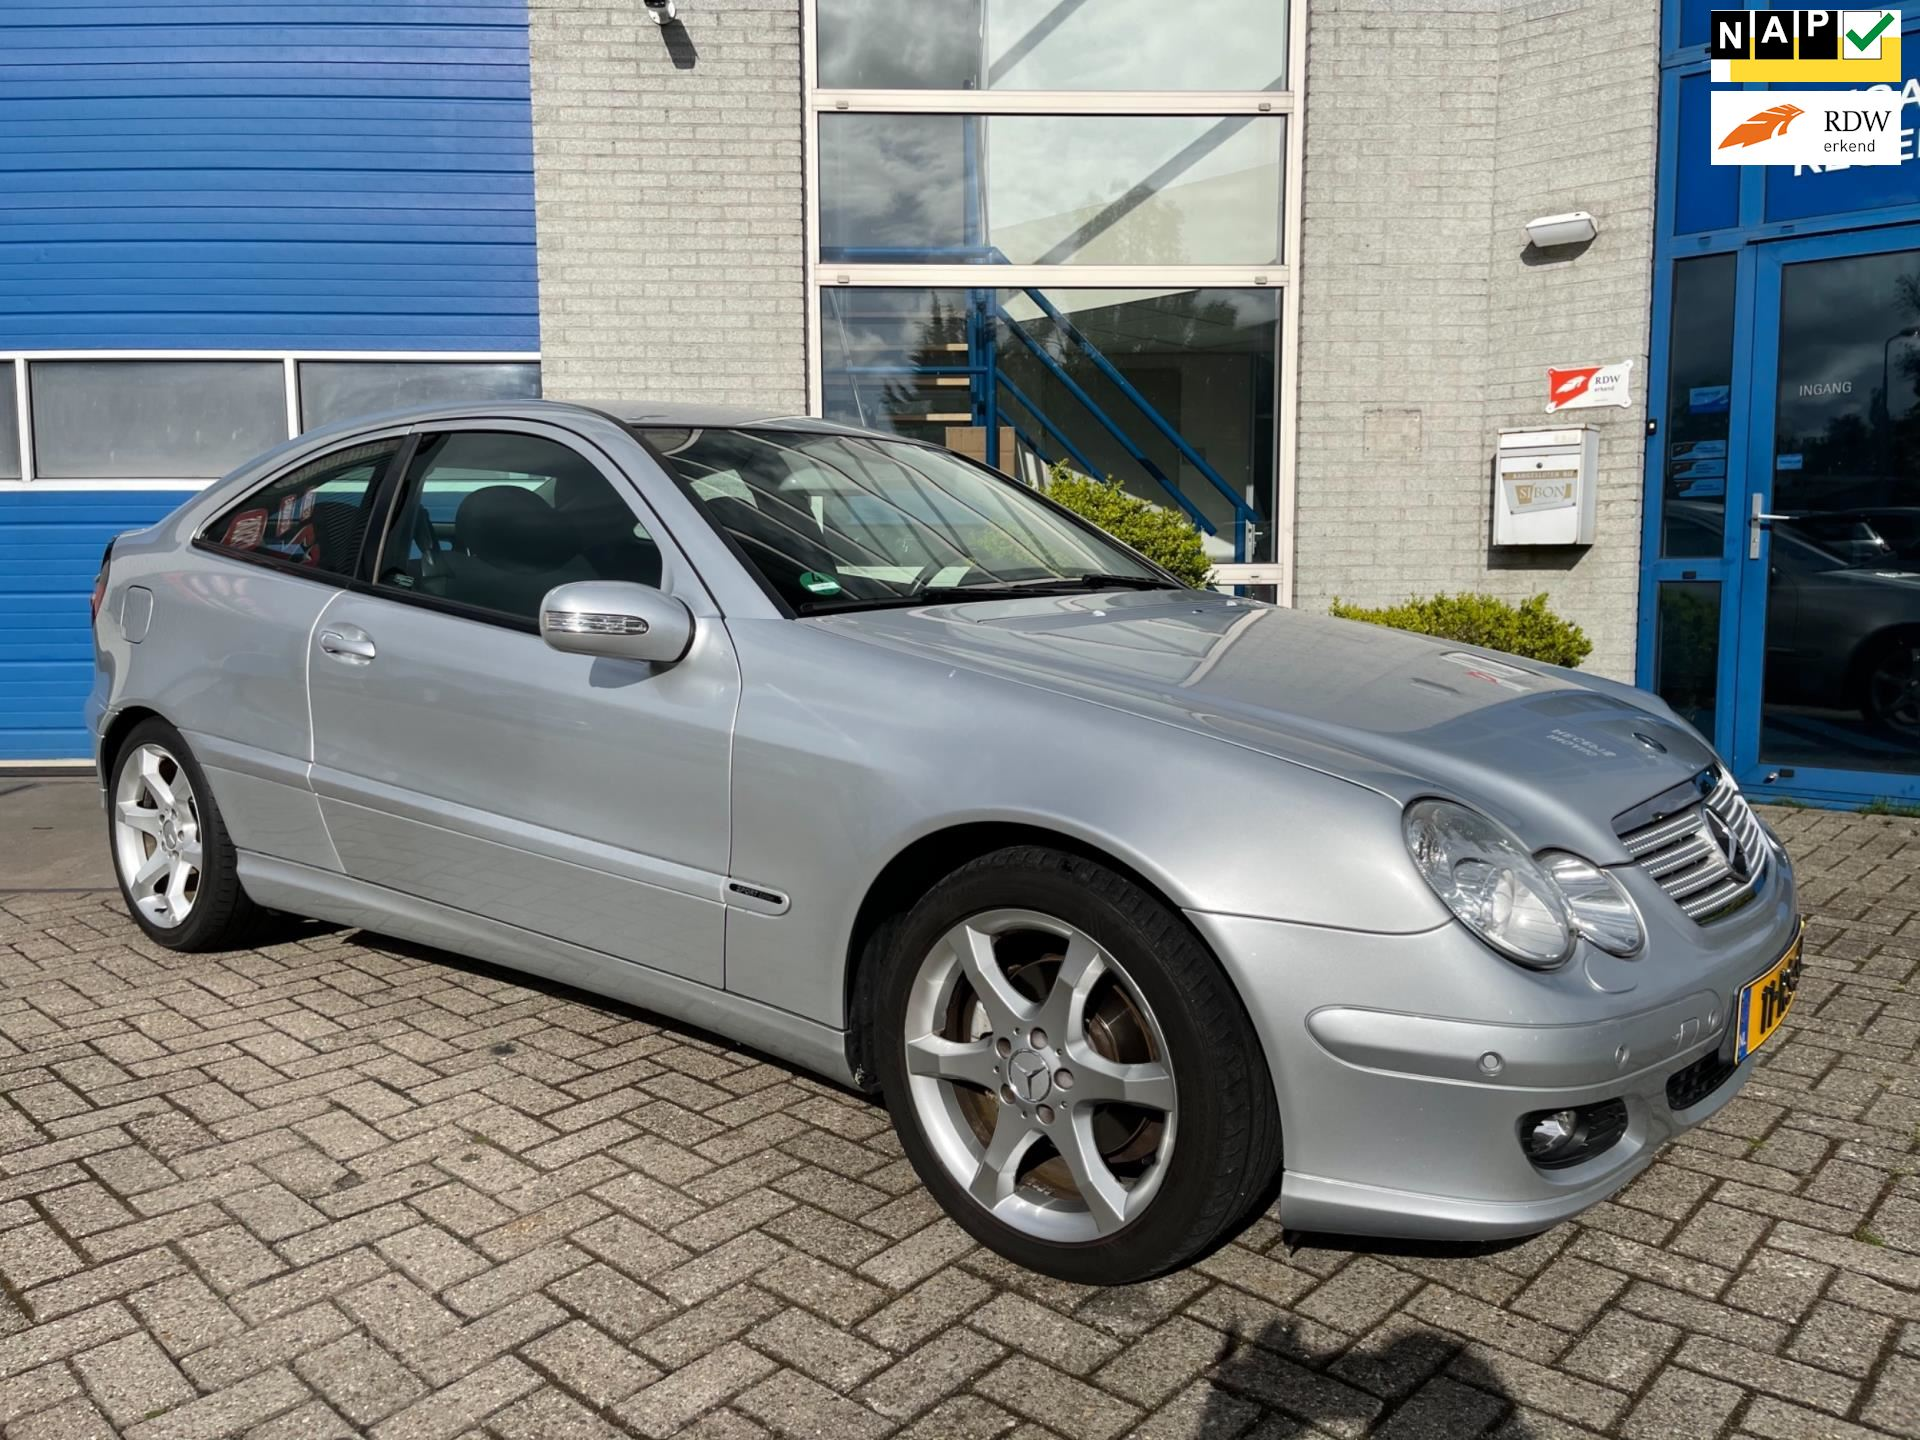 Mercedes-Benz C-klasse Sportcoupé occasion - Autocentrum Zaanstad